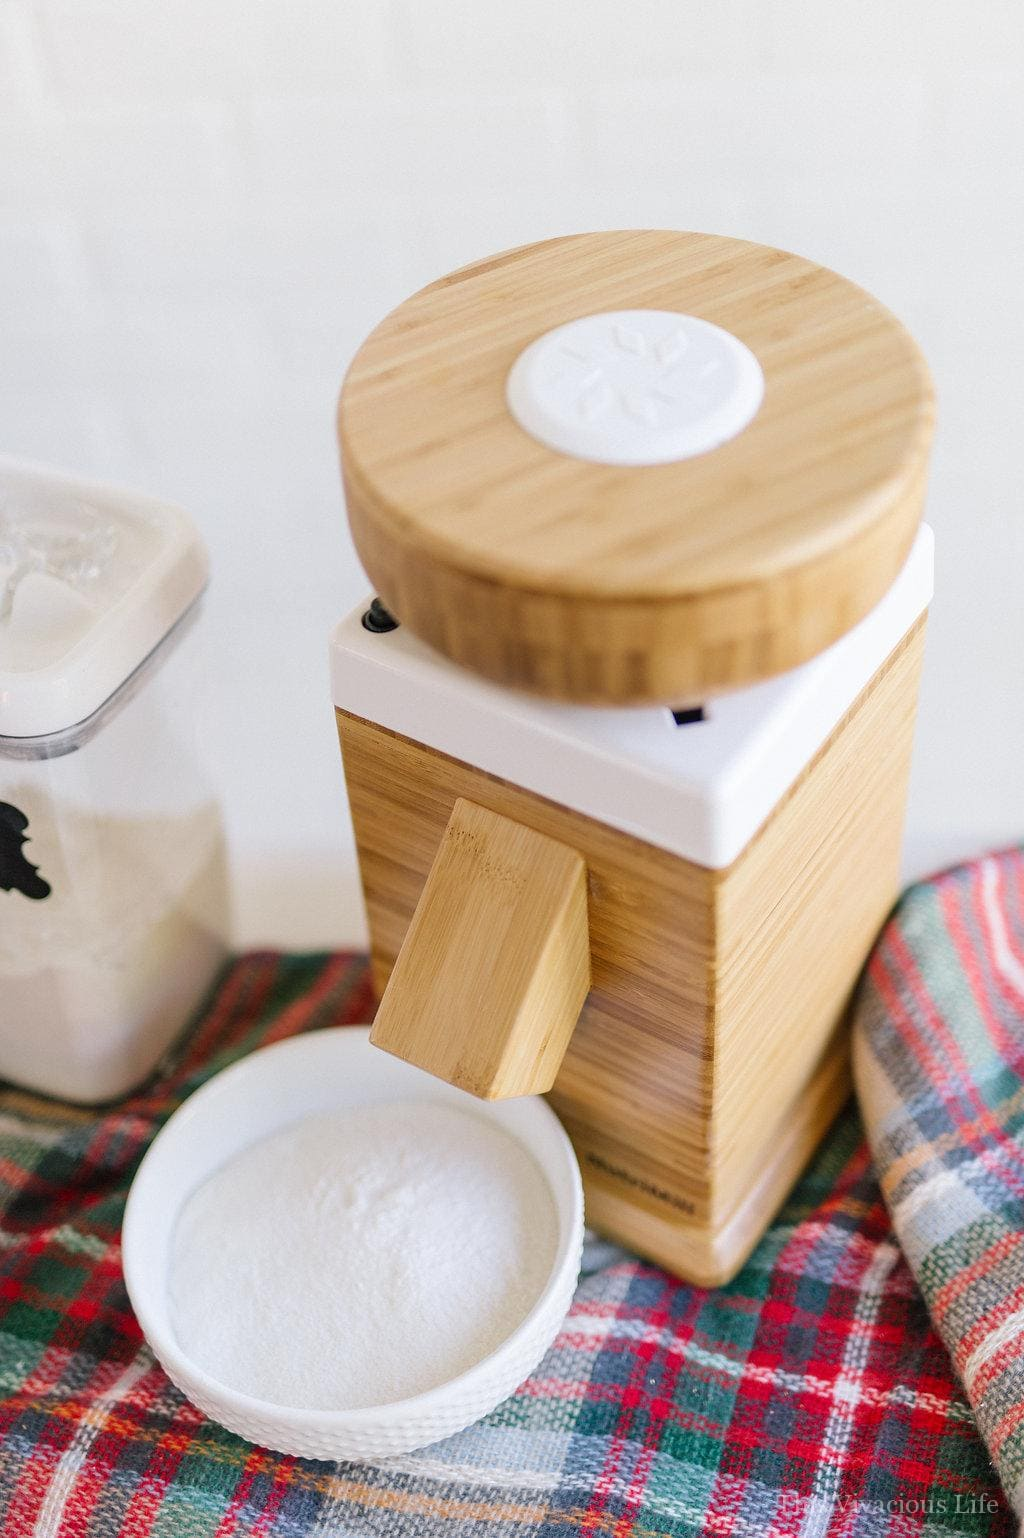 Wood Nutrimill flour grinder on a plaid blanket